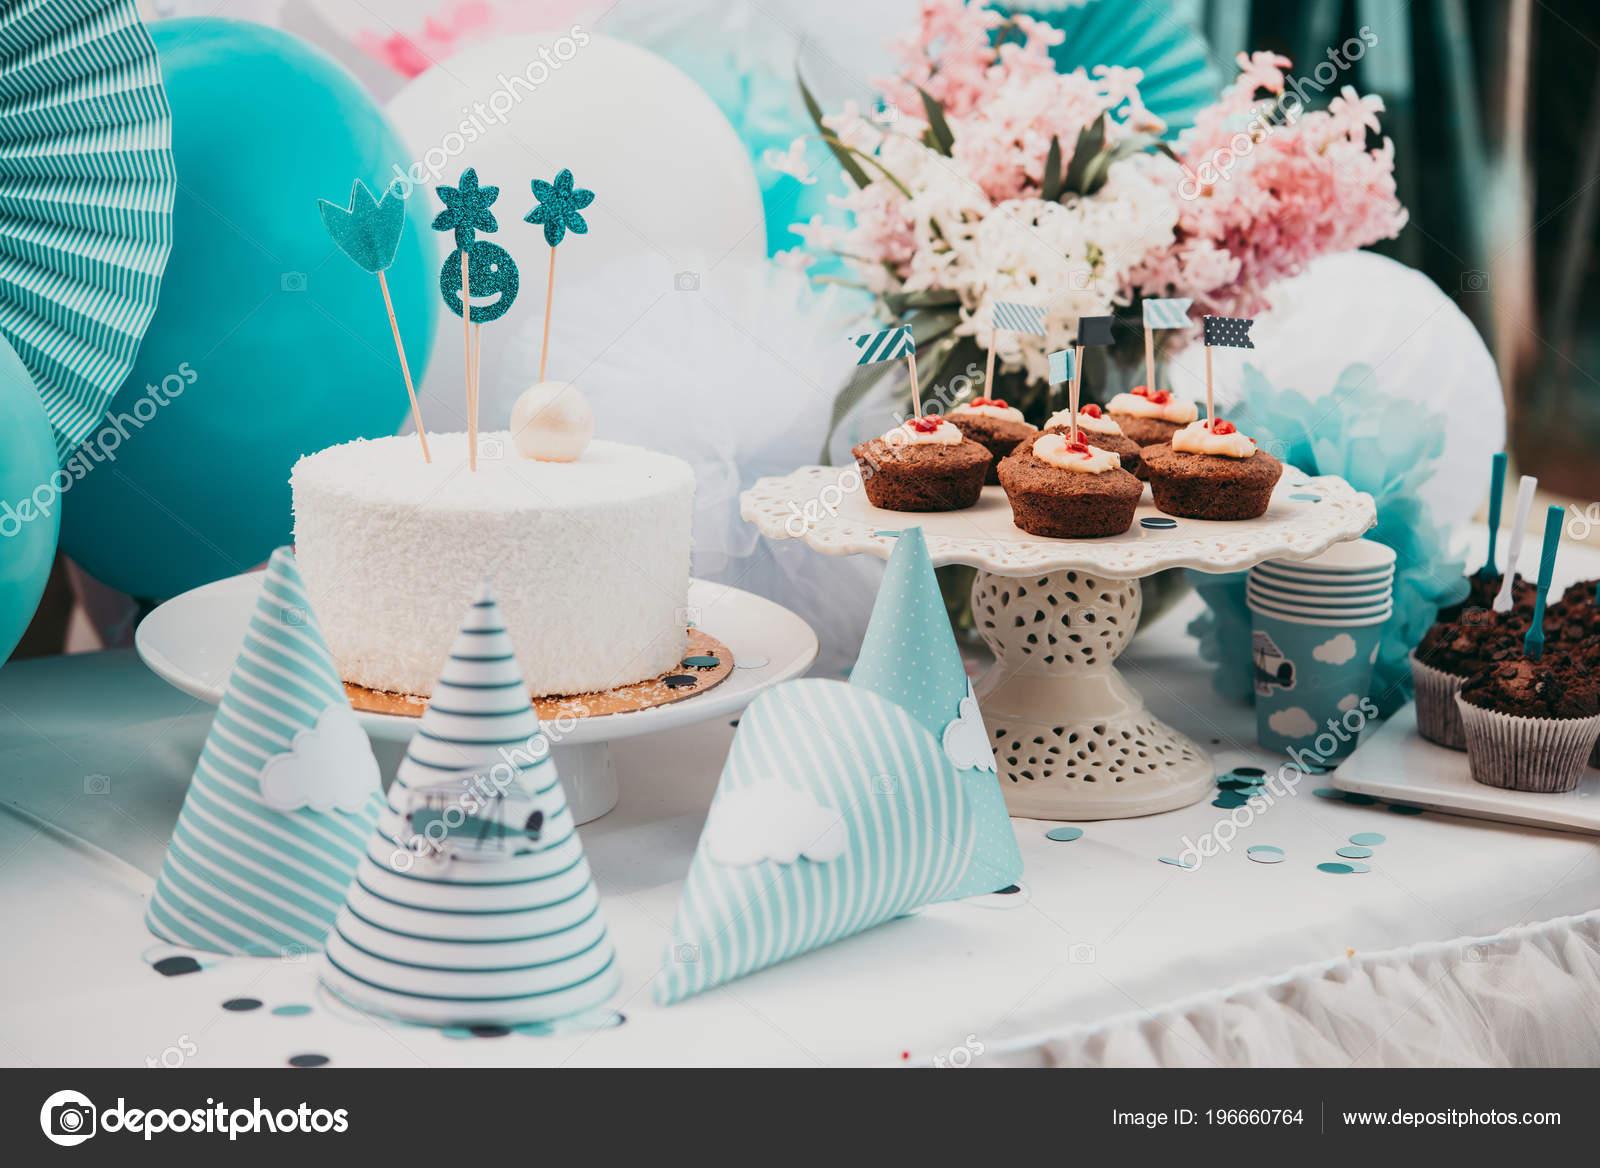 Kids Birthday Party Table Decoration Stockfoto